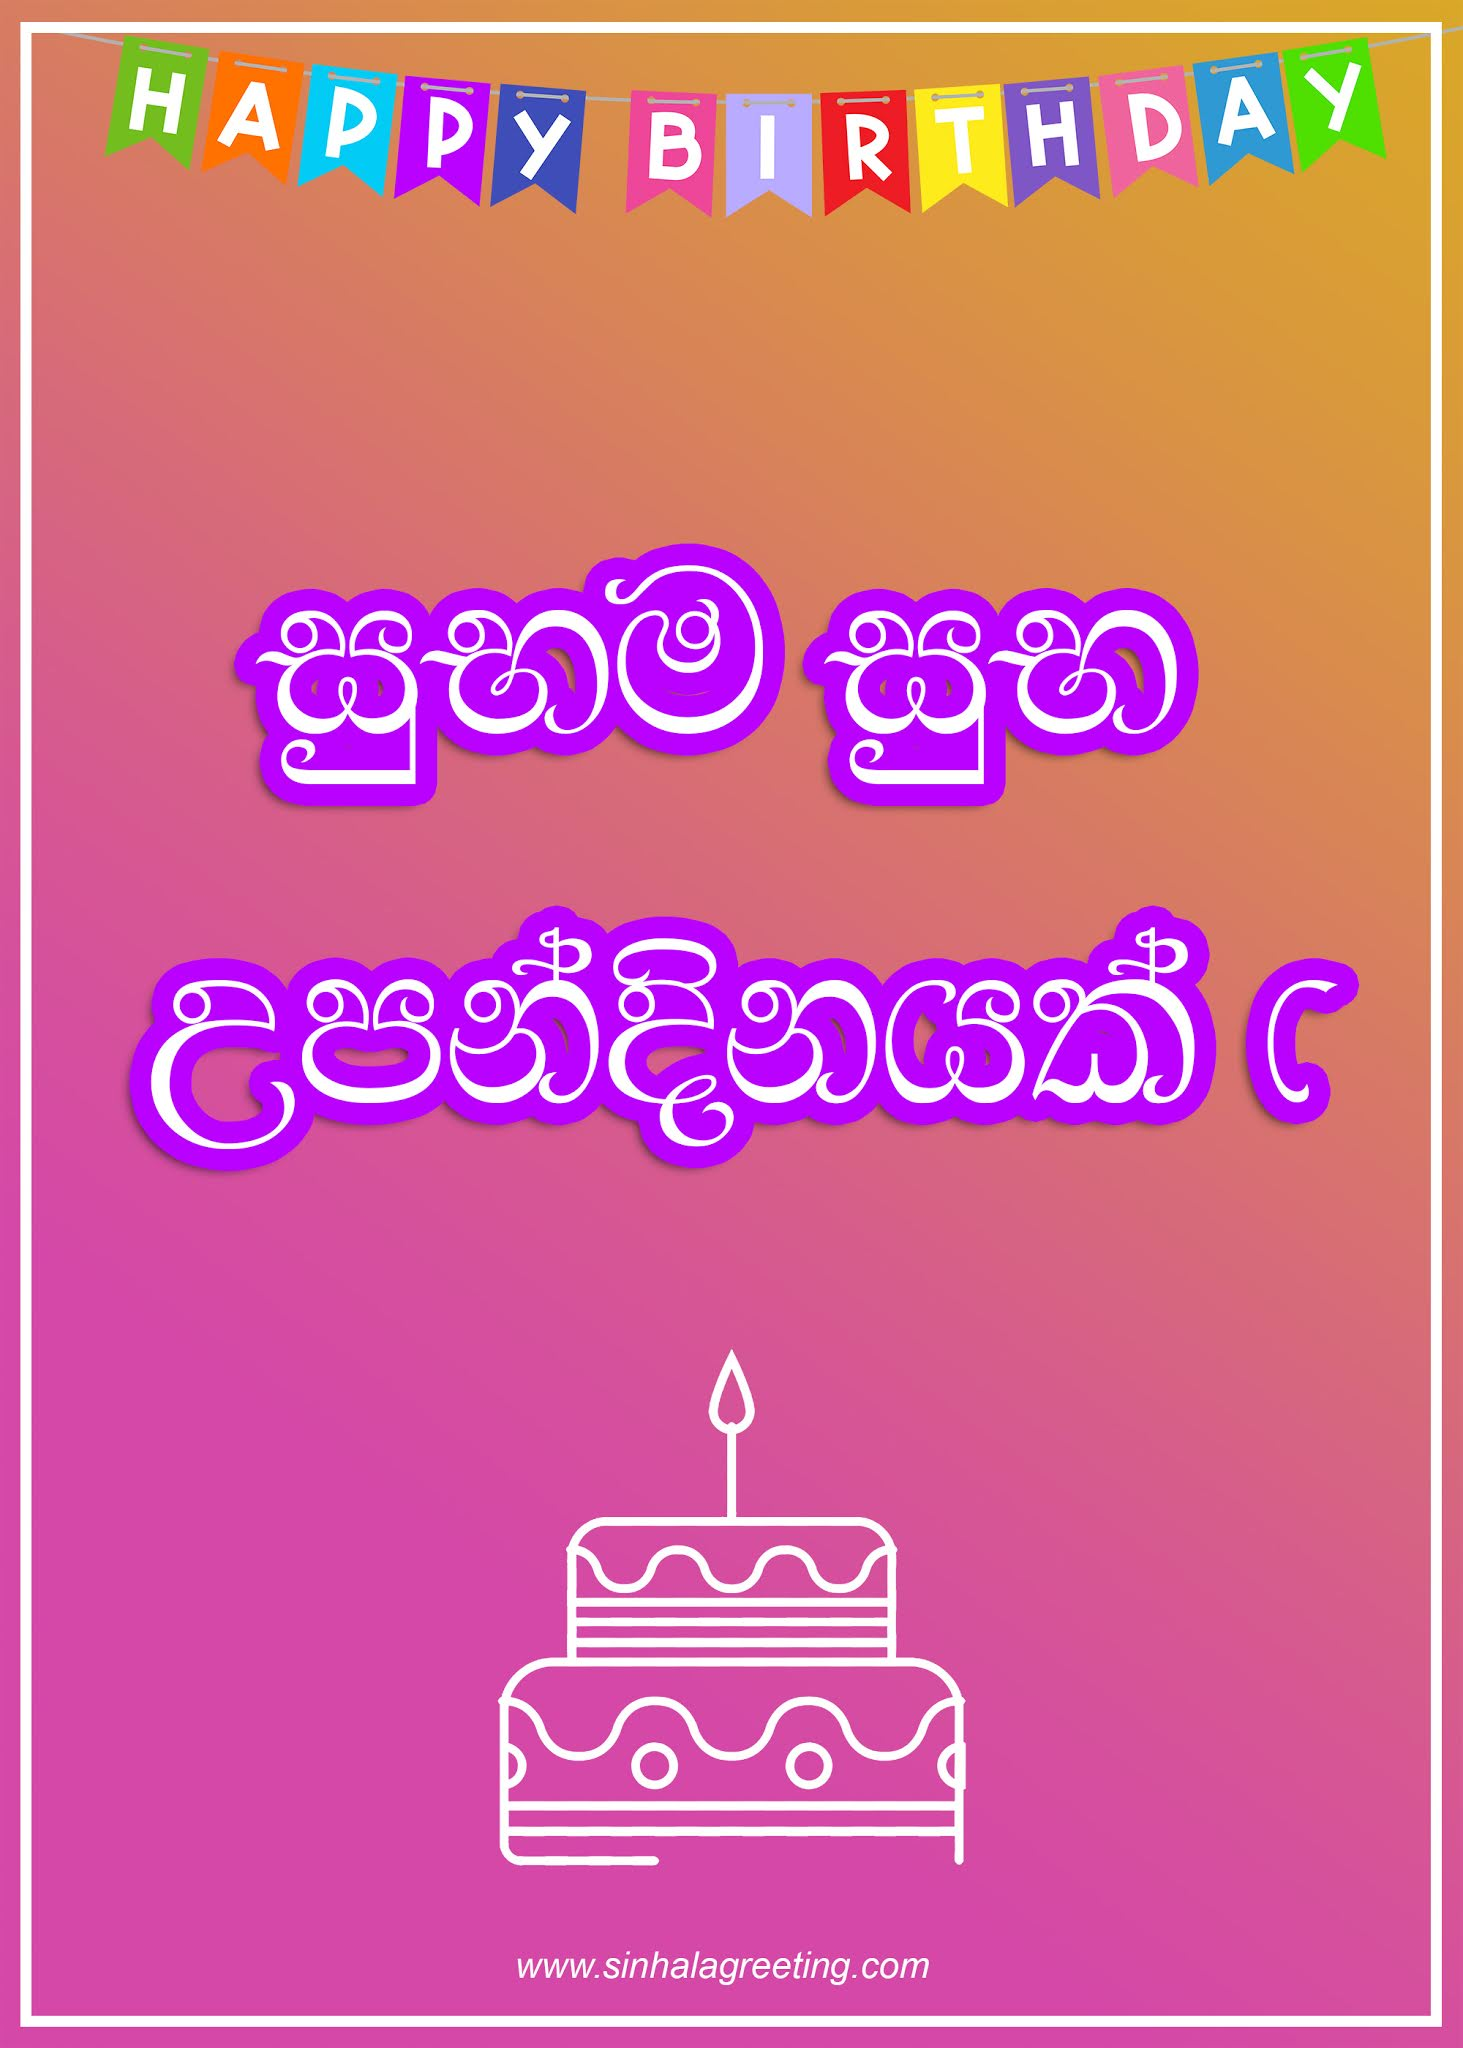 Whatsapp Sinhala Birthday Wish Status Sinhala Birthday Cards Sinhala Greeting Cards Wishes You can copy the image link and post in facebook comments and share. whatsapp sinhala birthday wish status